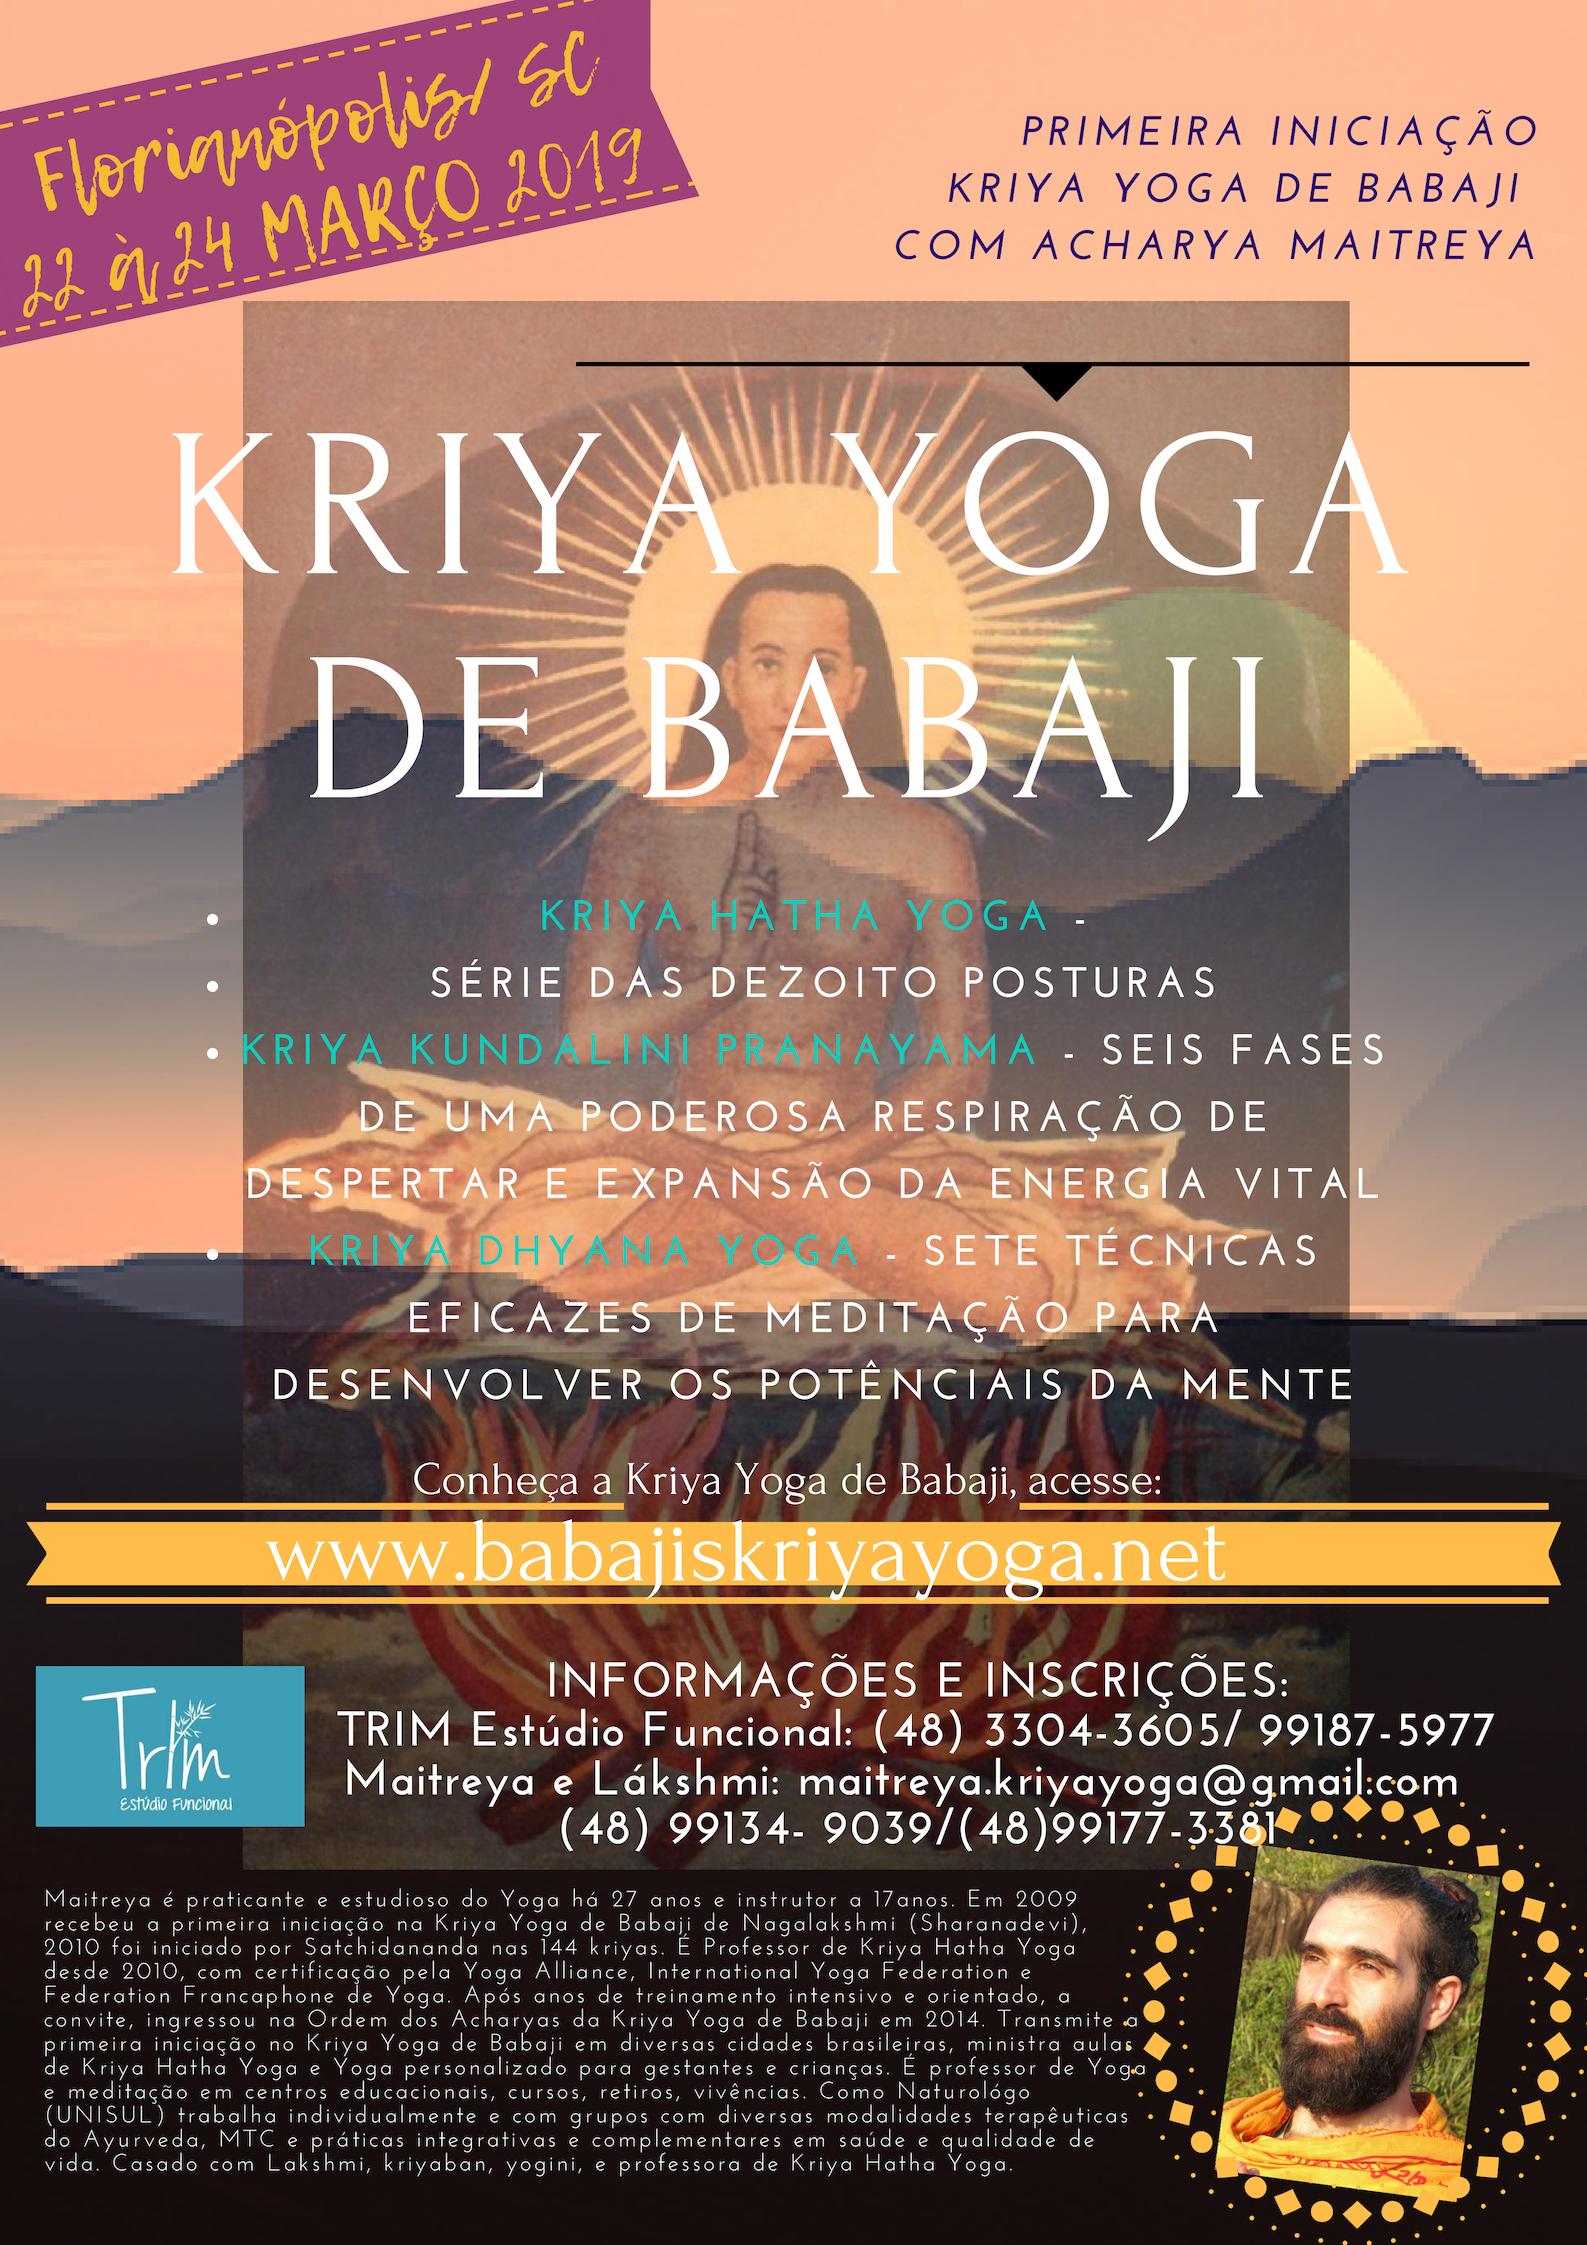 Primeira inicia%c3%a7%c3%a3o kriya yoga de babaji com acharya maitreya